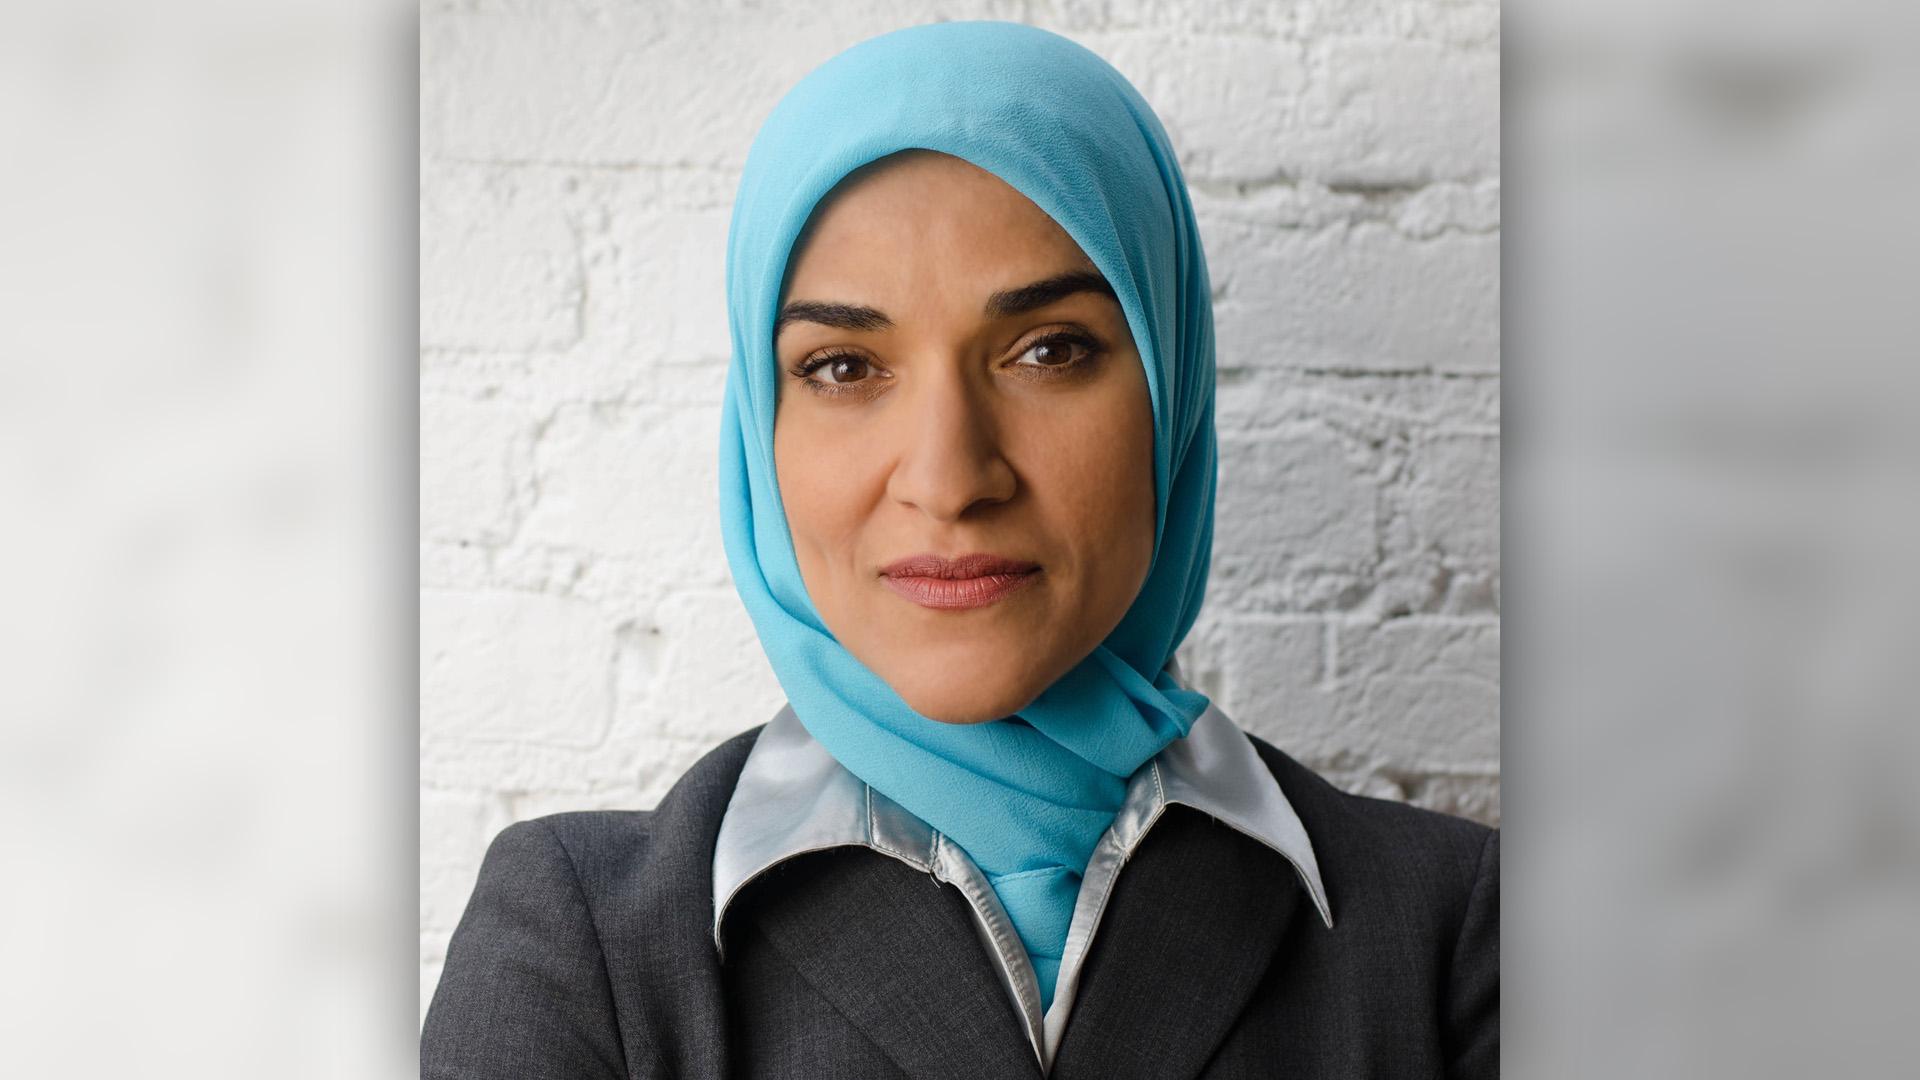 Dalia Mogahed on Islam and the Promise of America